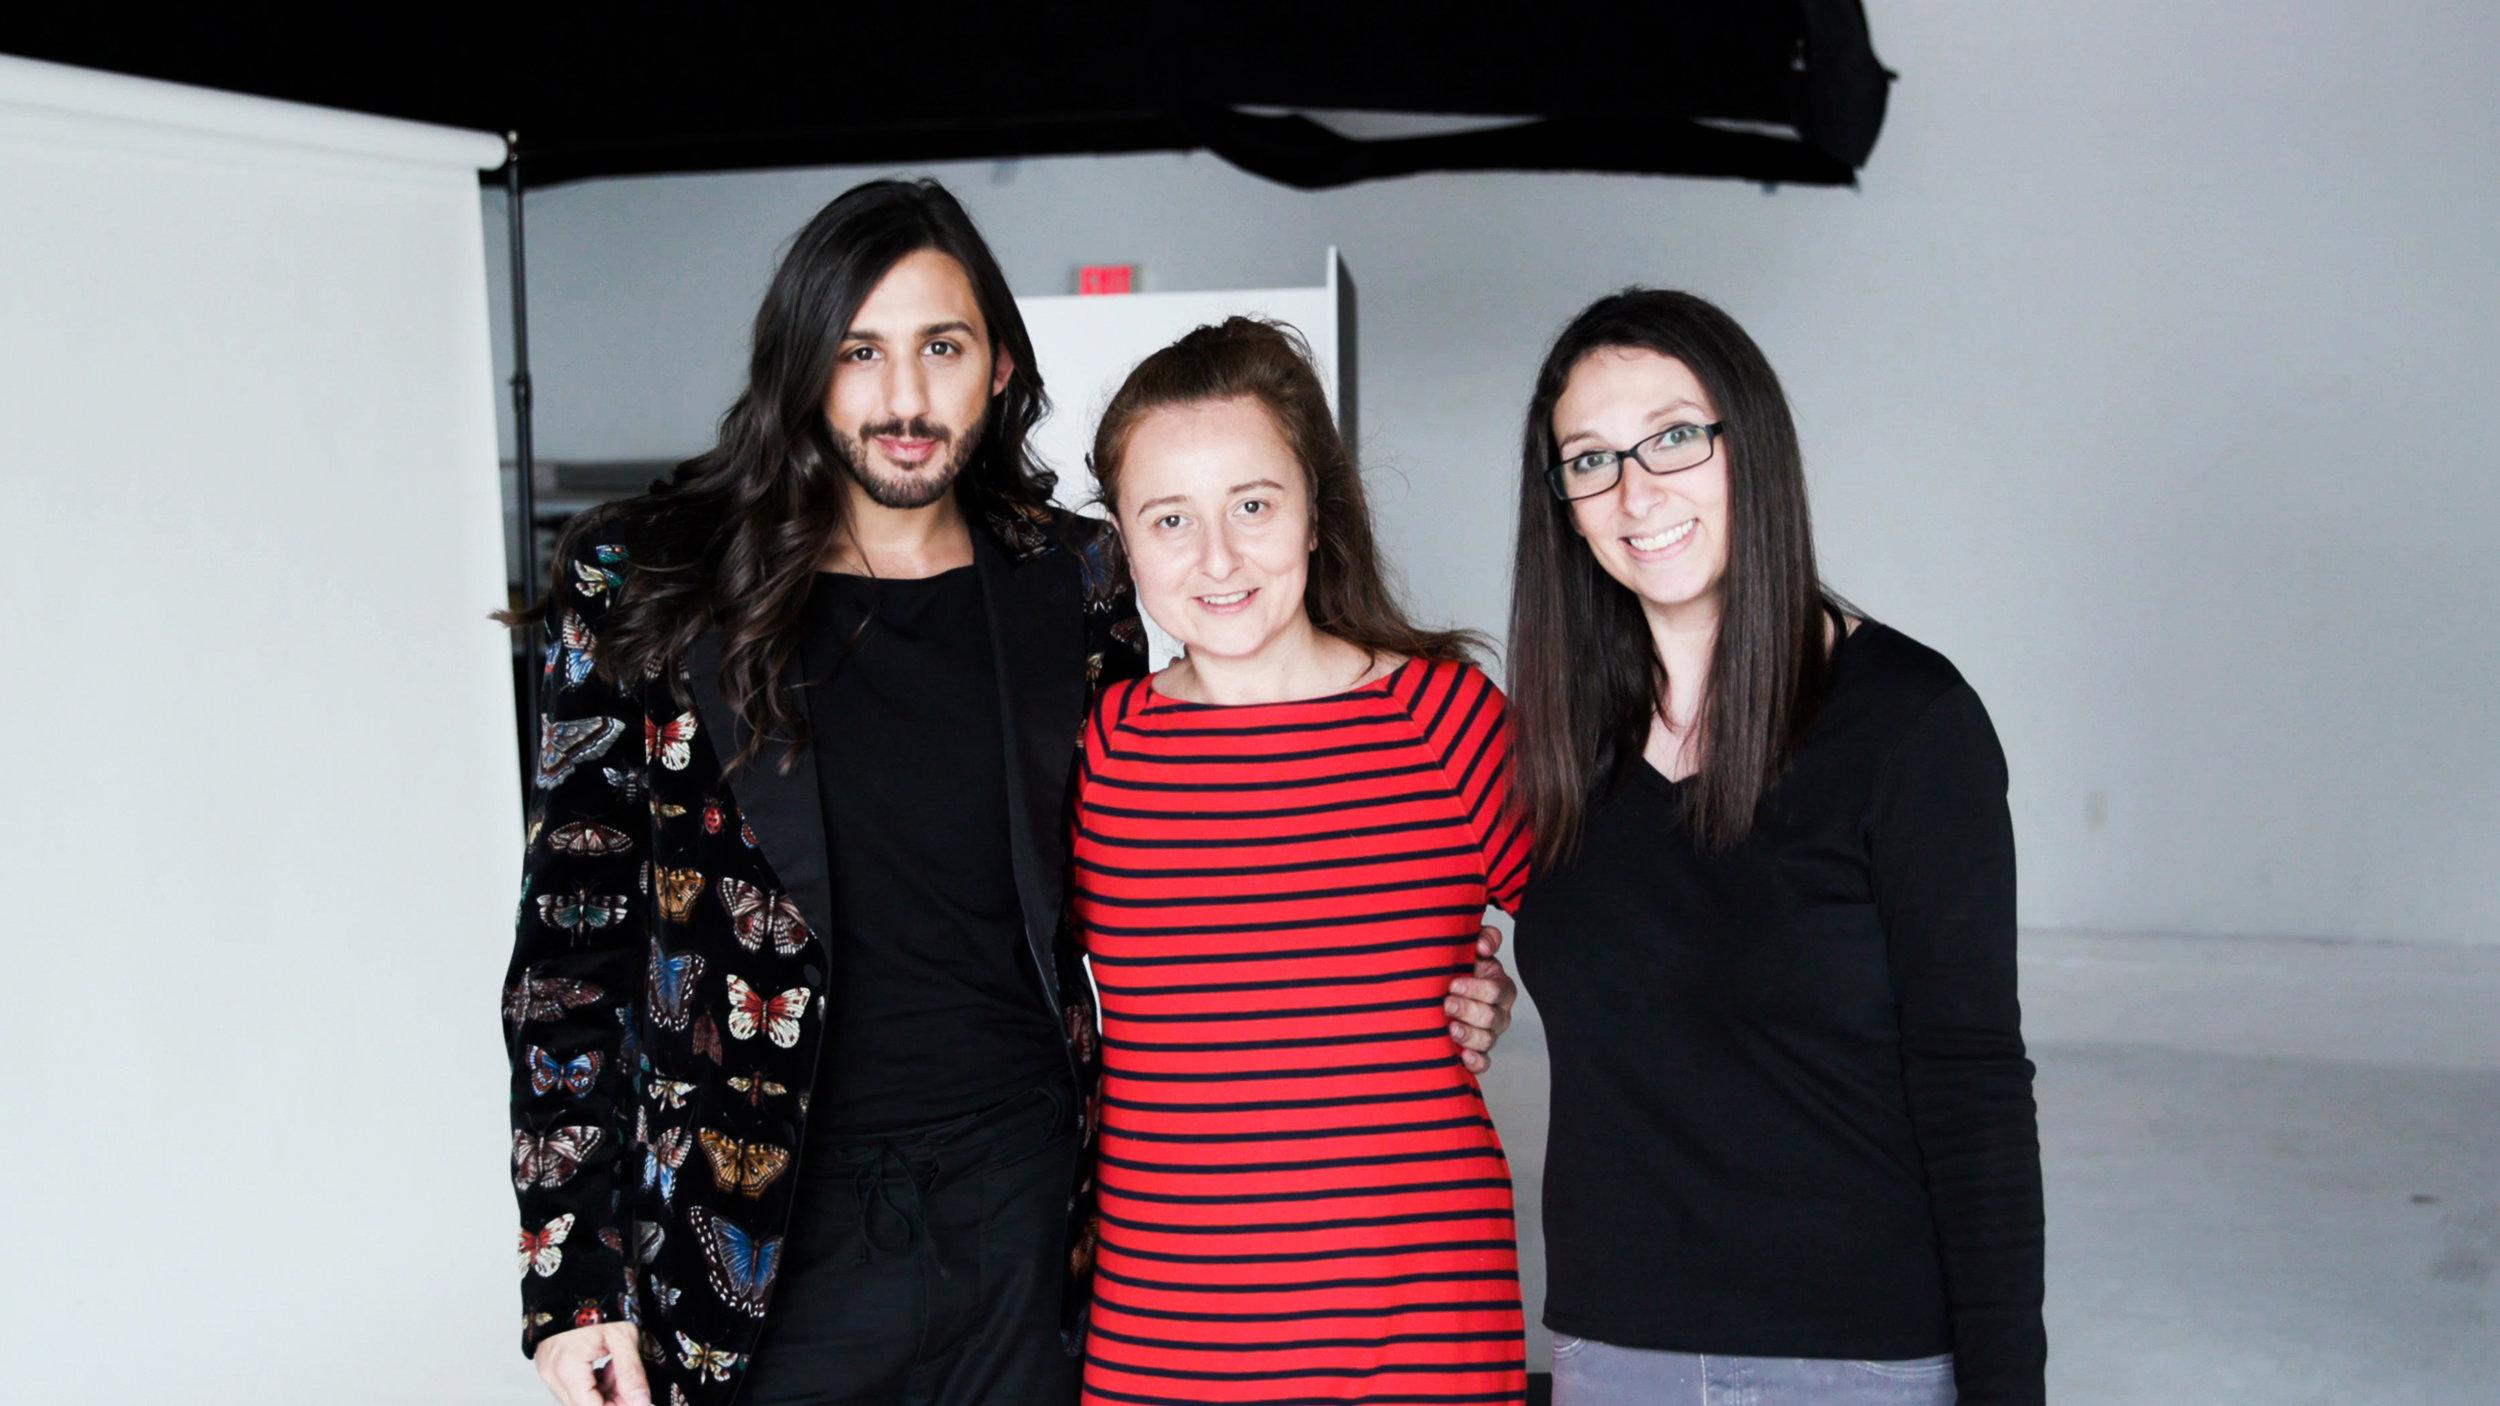 Behind-the-scenes: Boston Magazine photo shoot for Best of Boston 2019. Photographer: Diana Levine. Timothy Ro, Mona Miri and Diana Levine